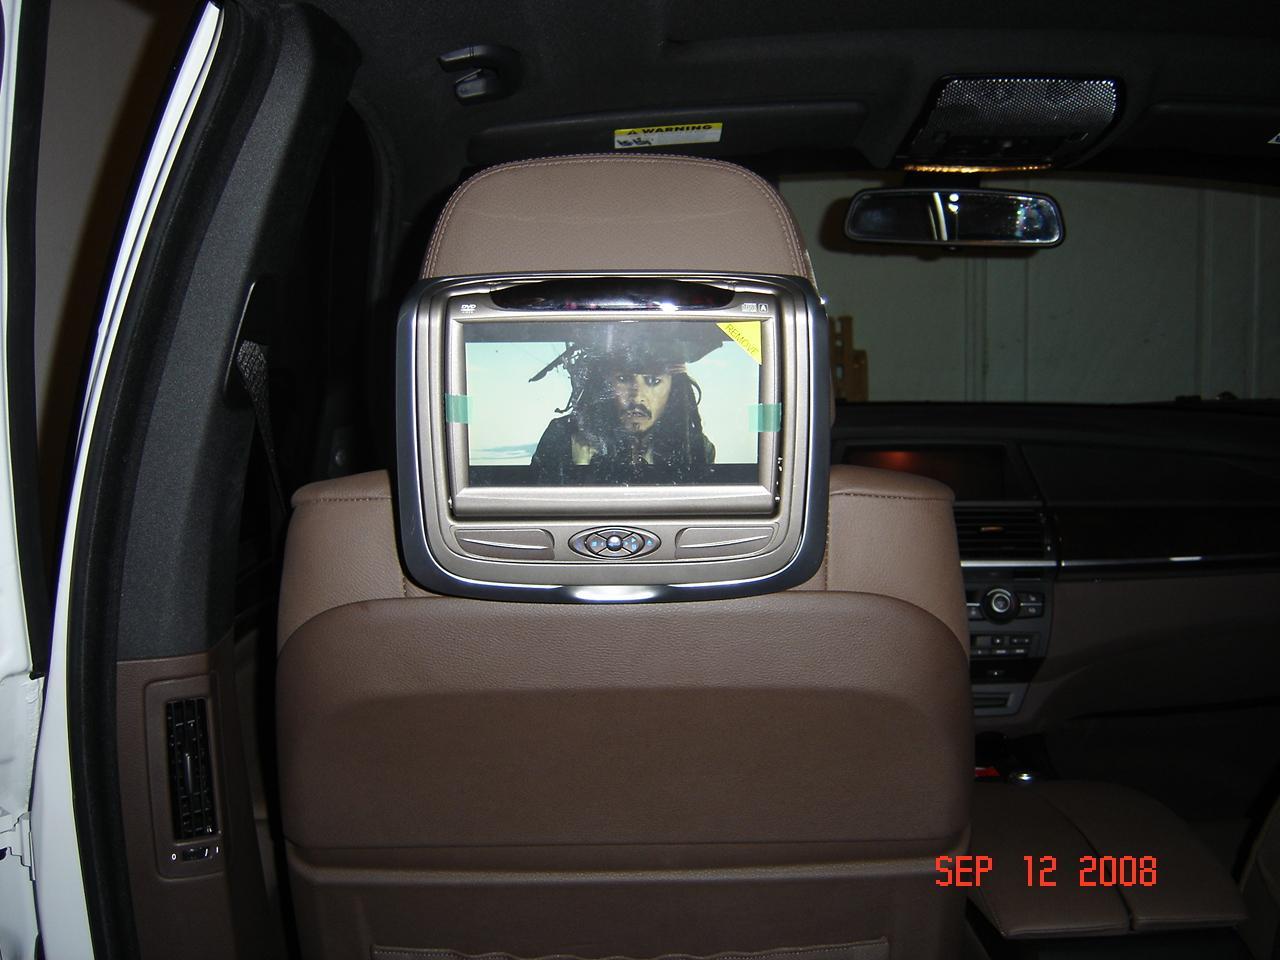 Fields BMW Winter Park >> Headrest DVD Installed- Invision SL - Xoutpost.com